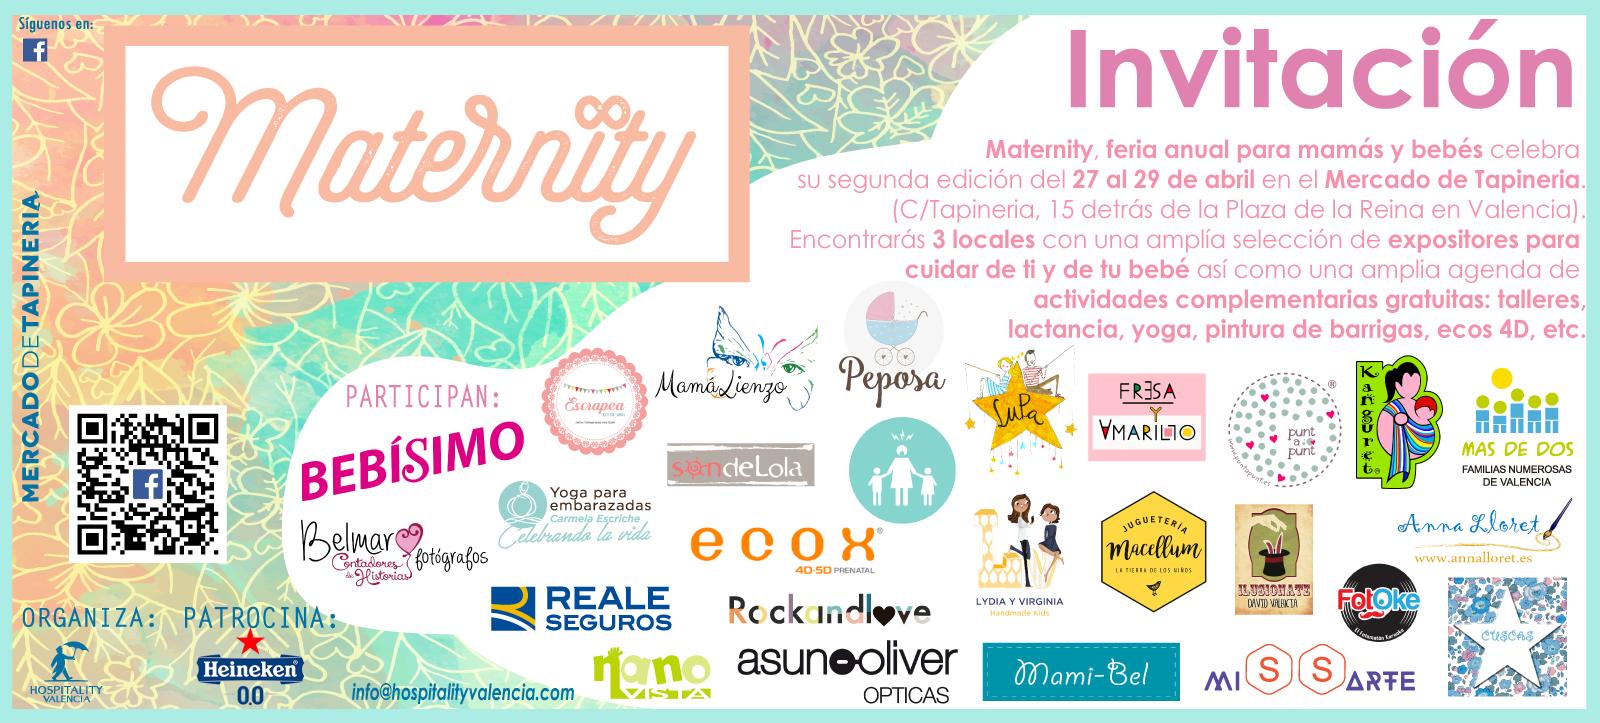 Agenda-Maternity-Valencia-Tapineria